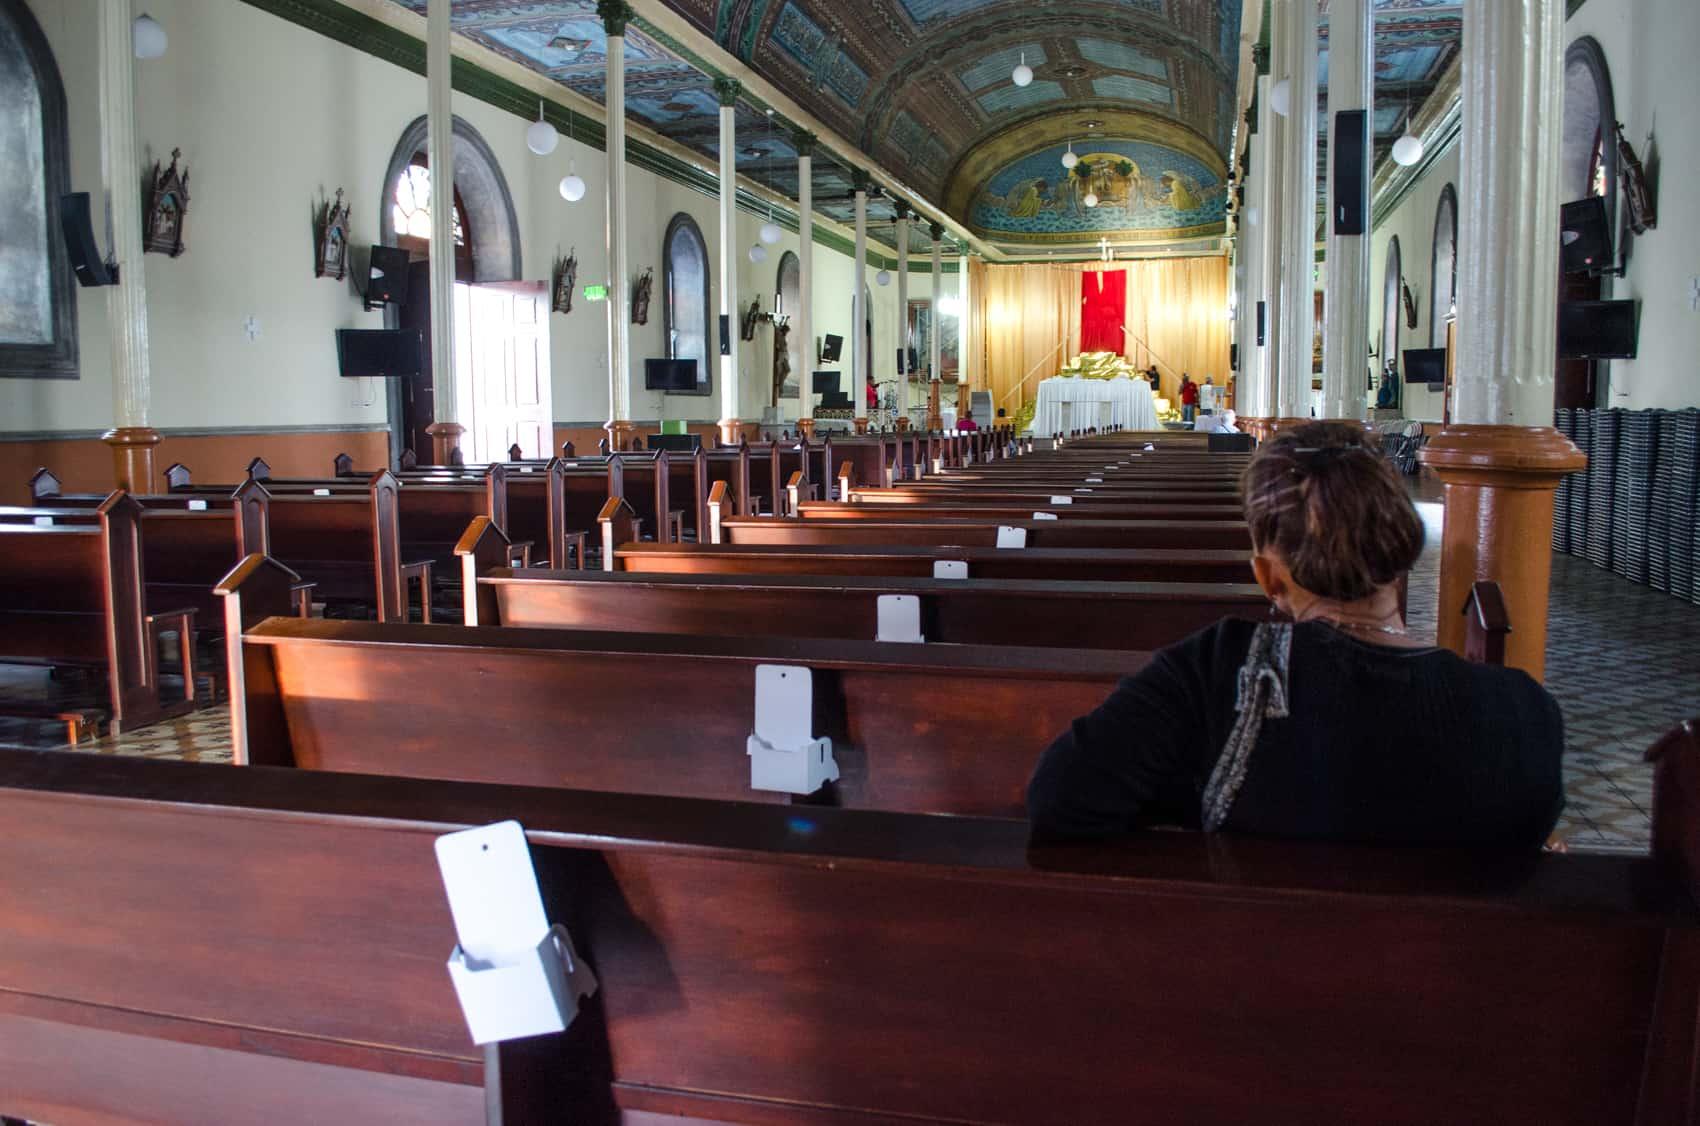 The nave of the Catholic Church in Santo Domingo de Heredia.